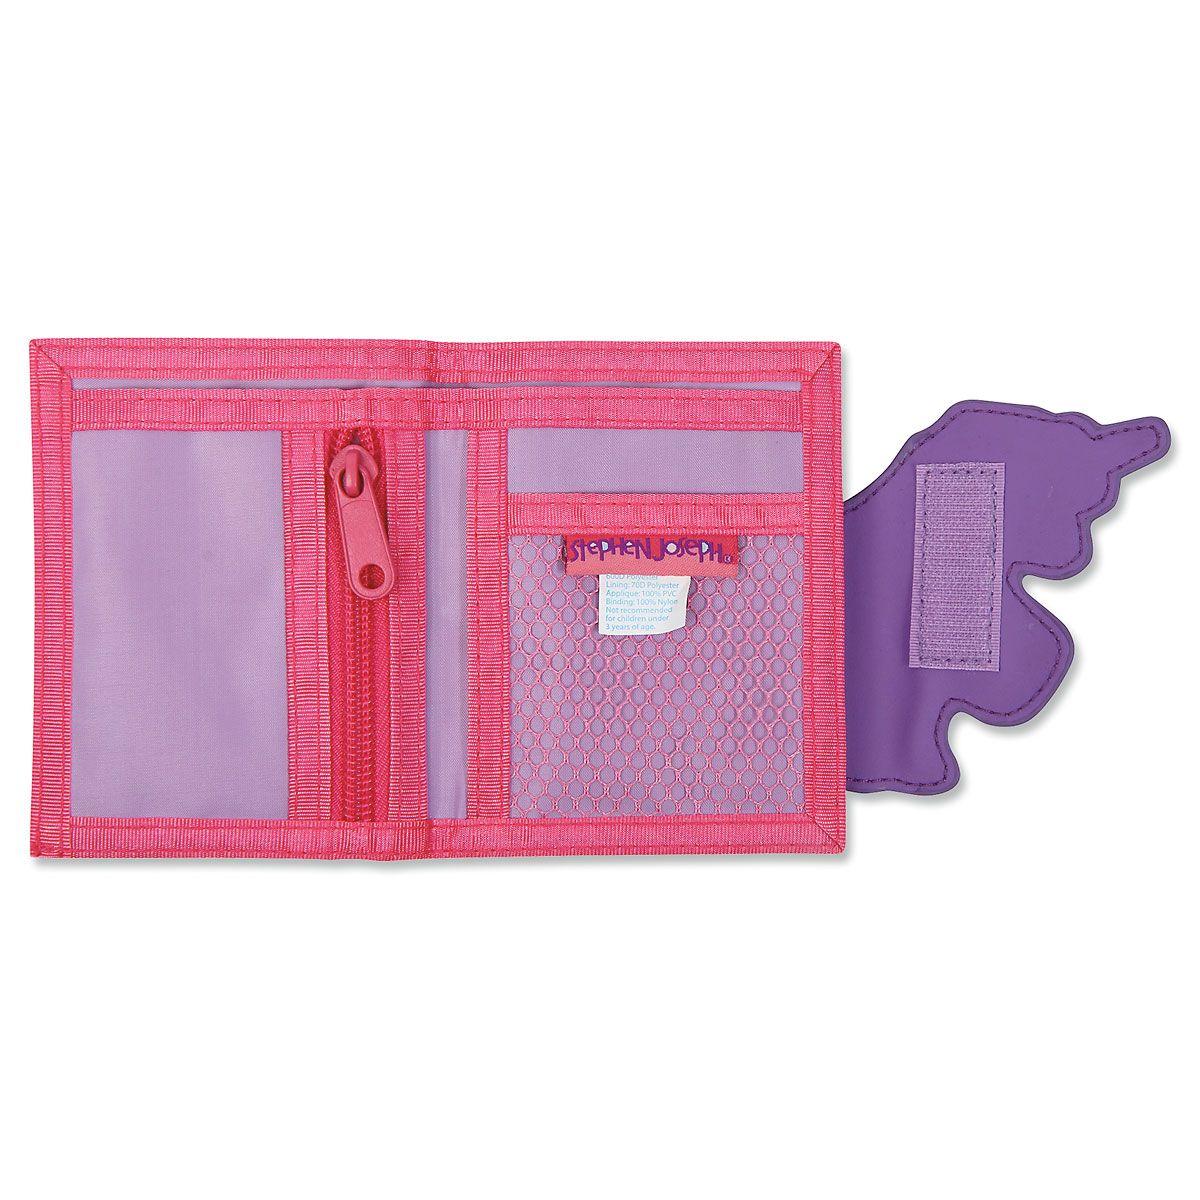 Personalized Unicorn Wallet by Stephen Joseph®